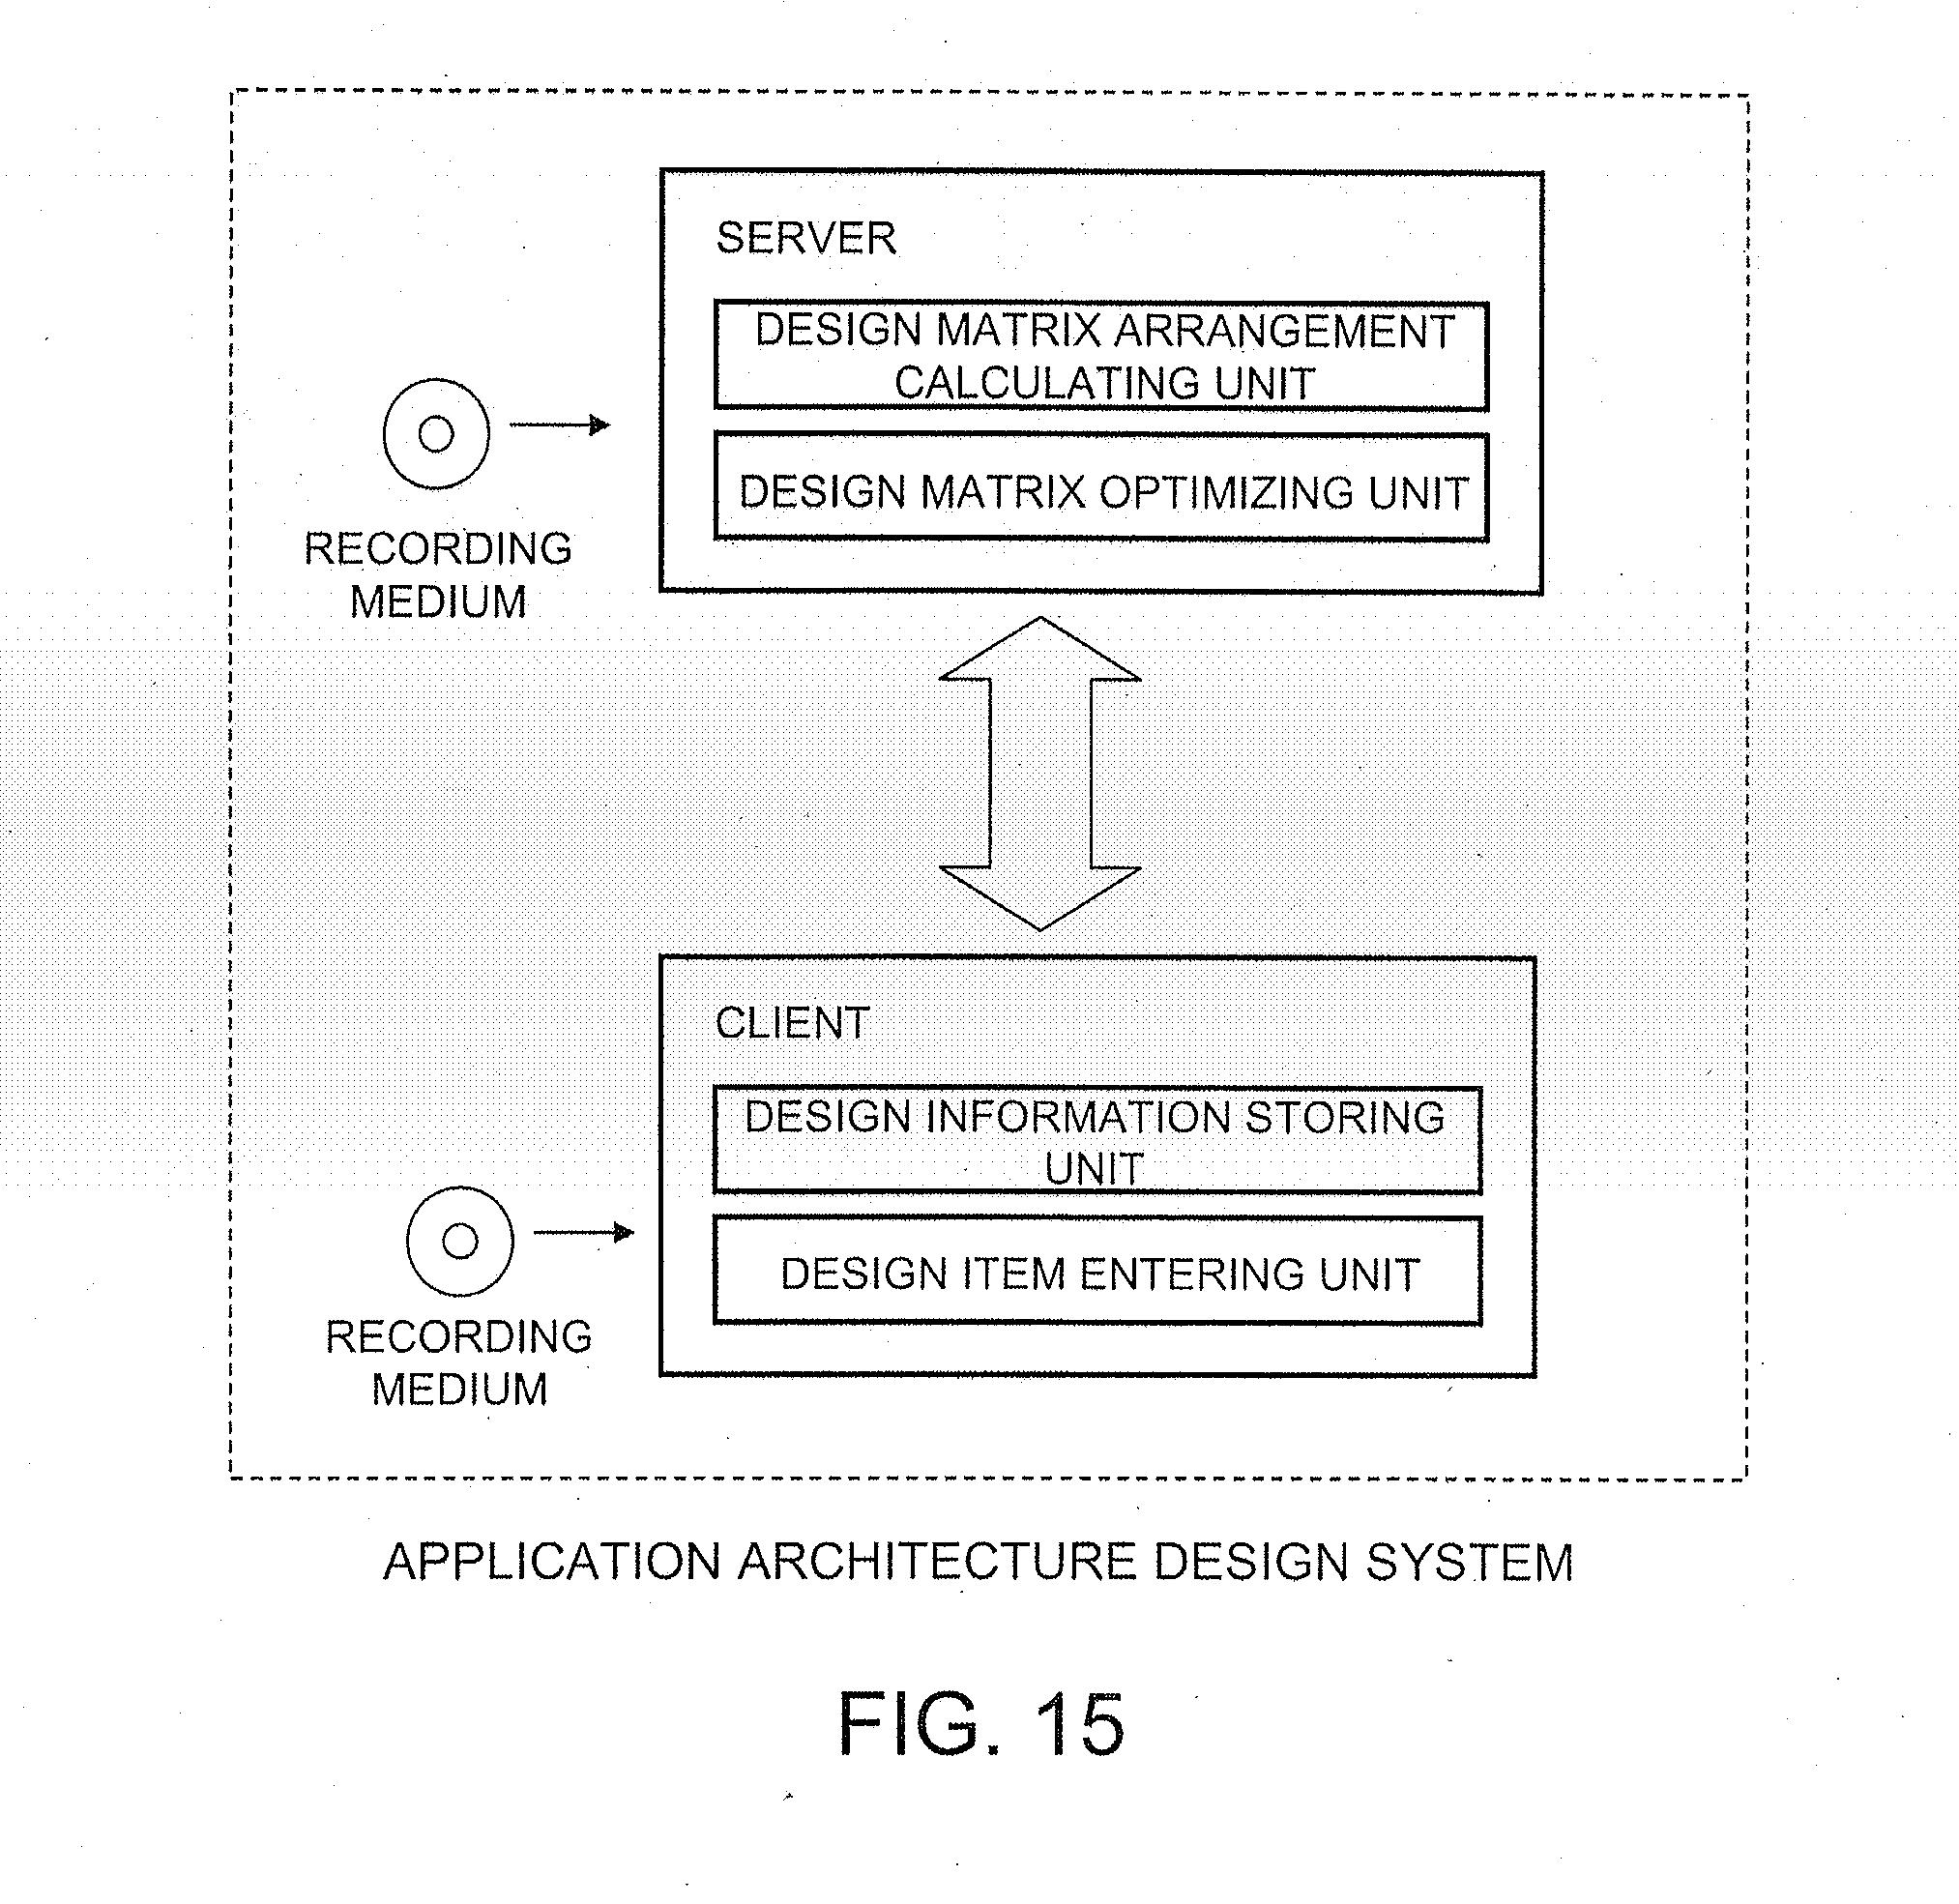 Patent Application Architecture Design Method